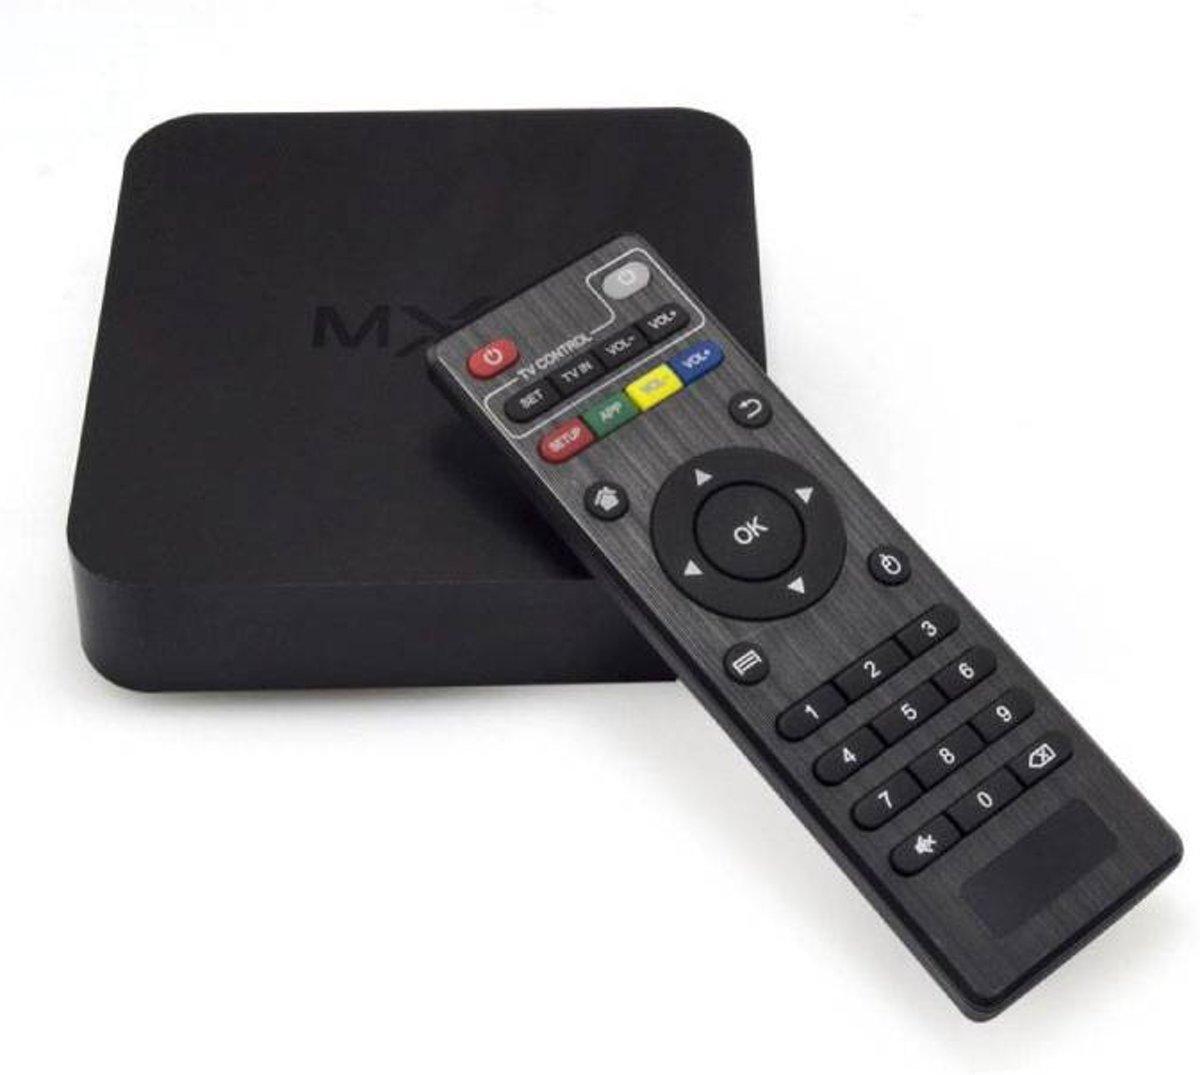 MXQ Android TV Multimedia Player Streamer Stream Box compatibel met Kodi - 1GB RAM - 2GB Opslagruimte